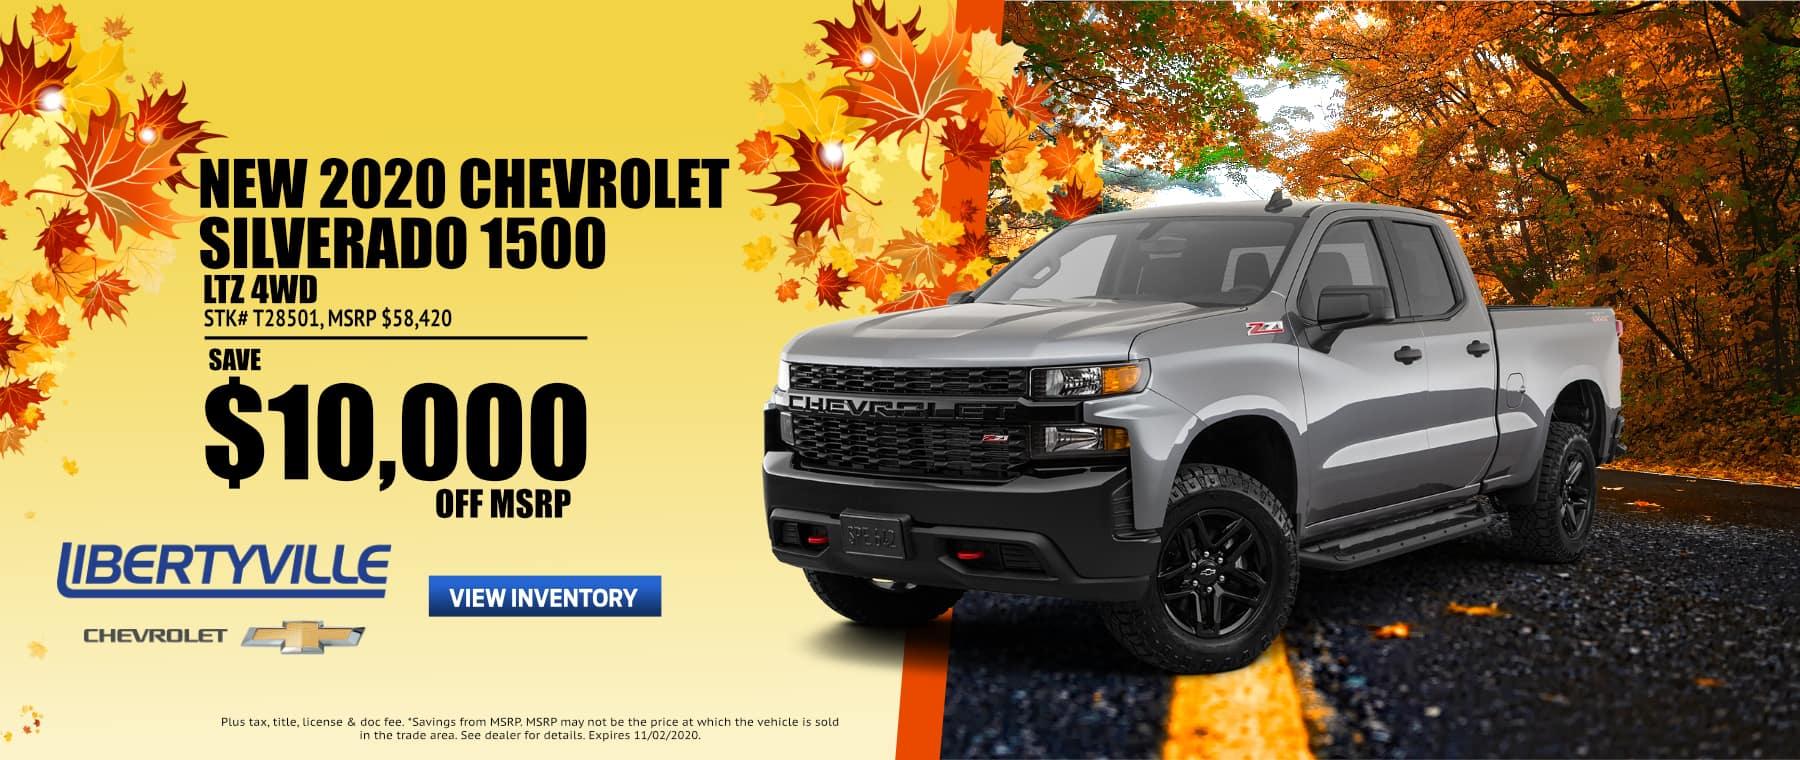 October-2020 SILVERADO 1500 New Website Libertyville